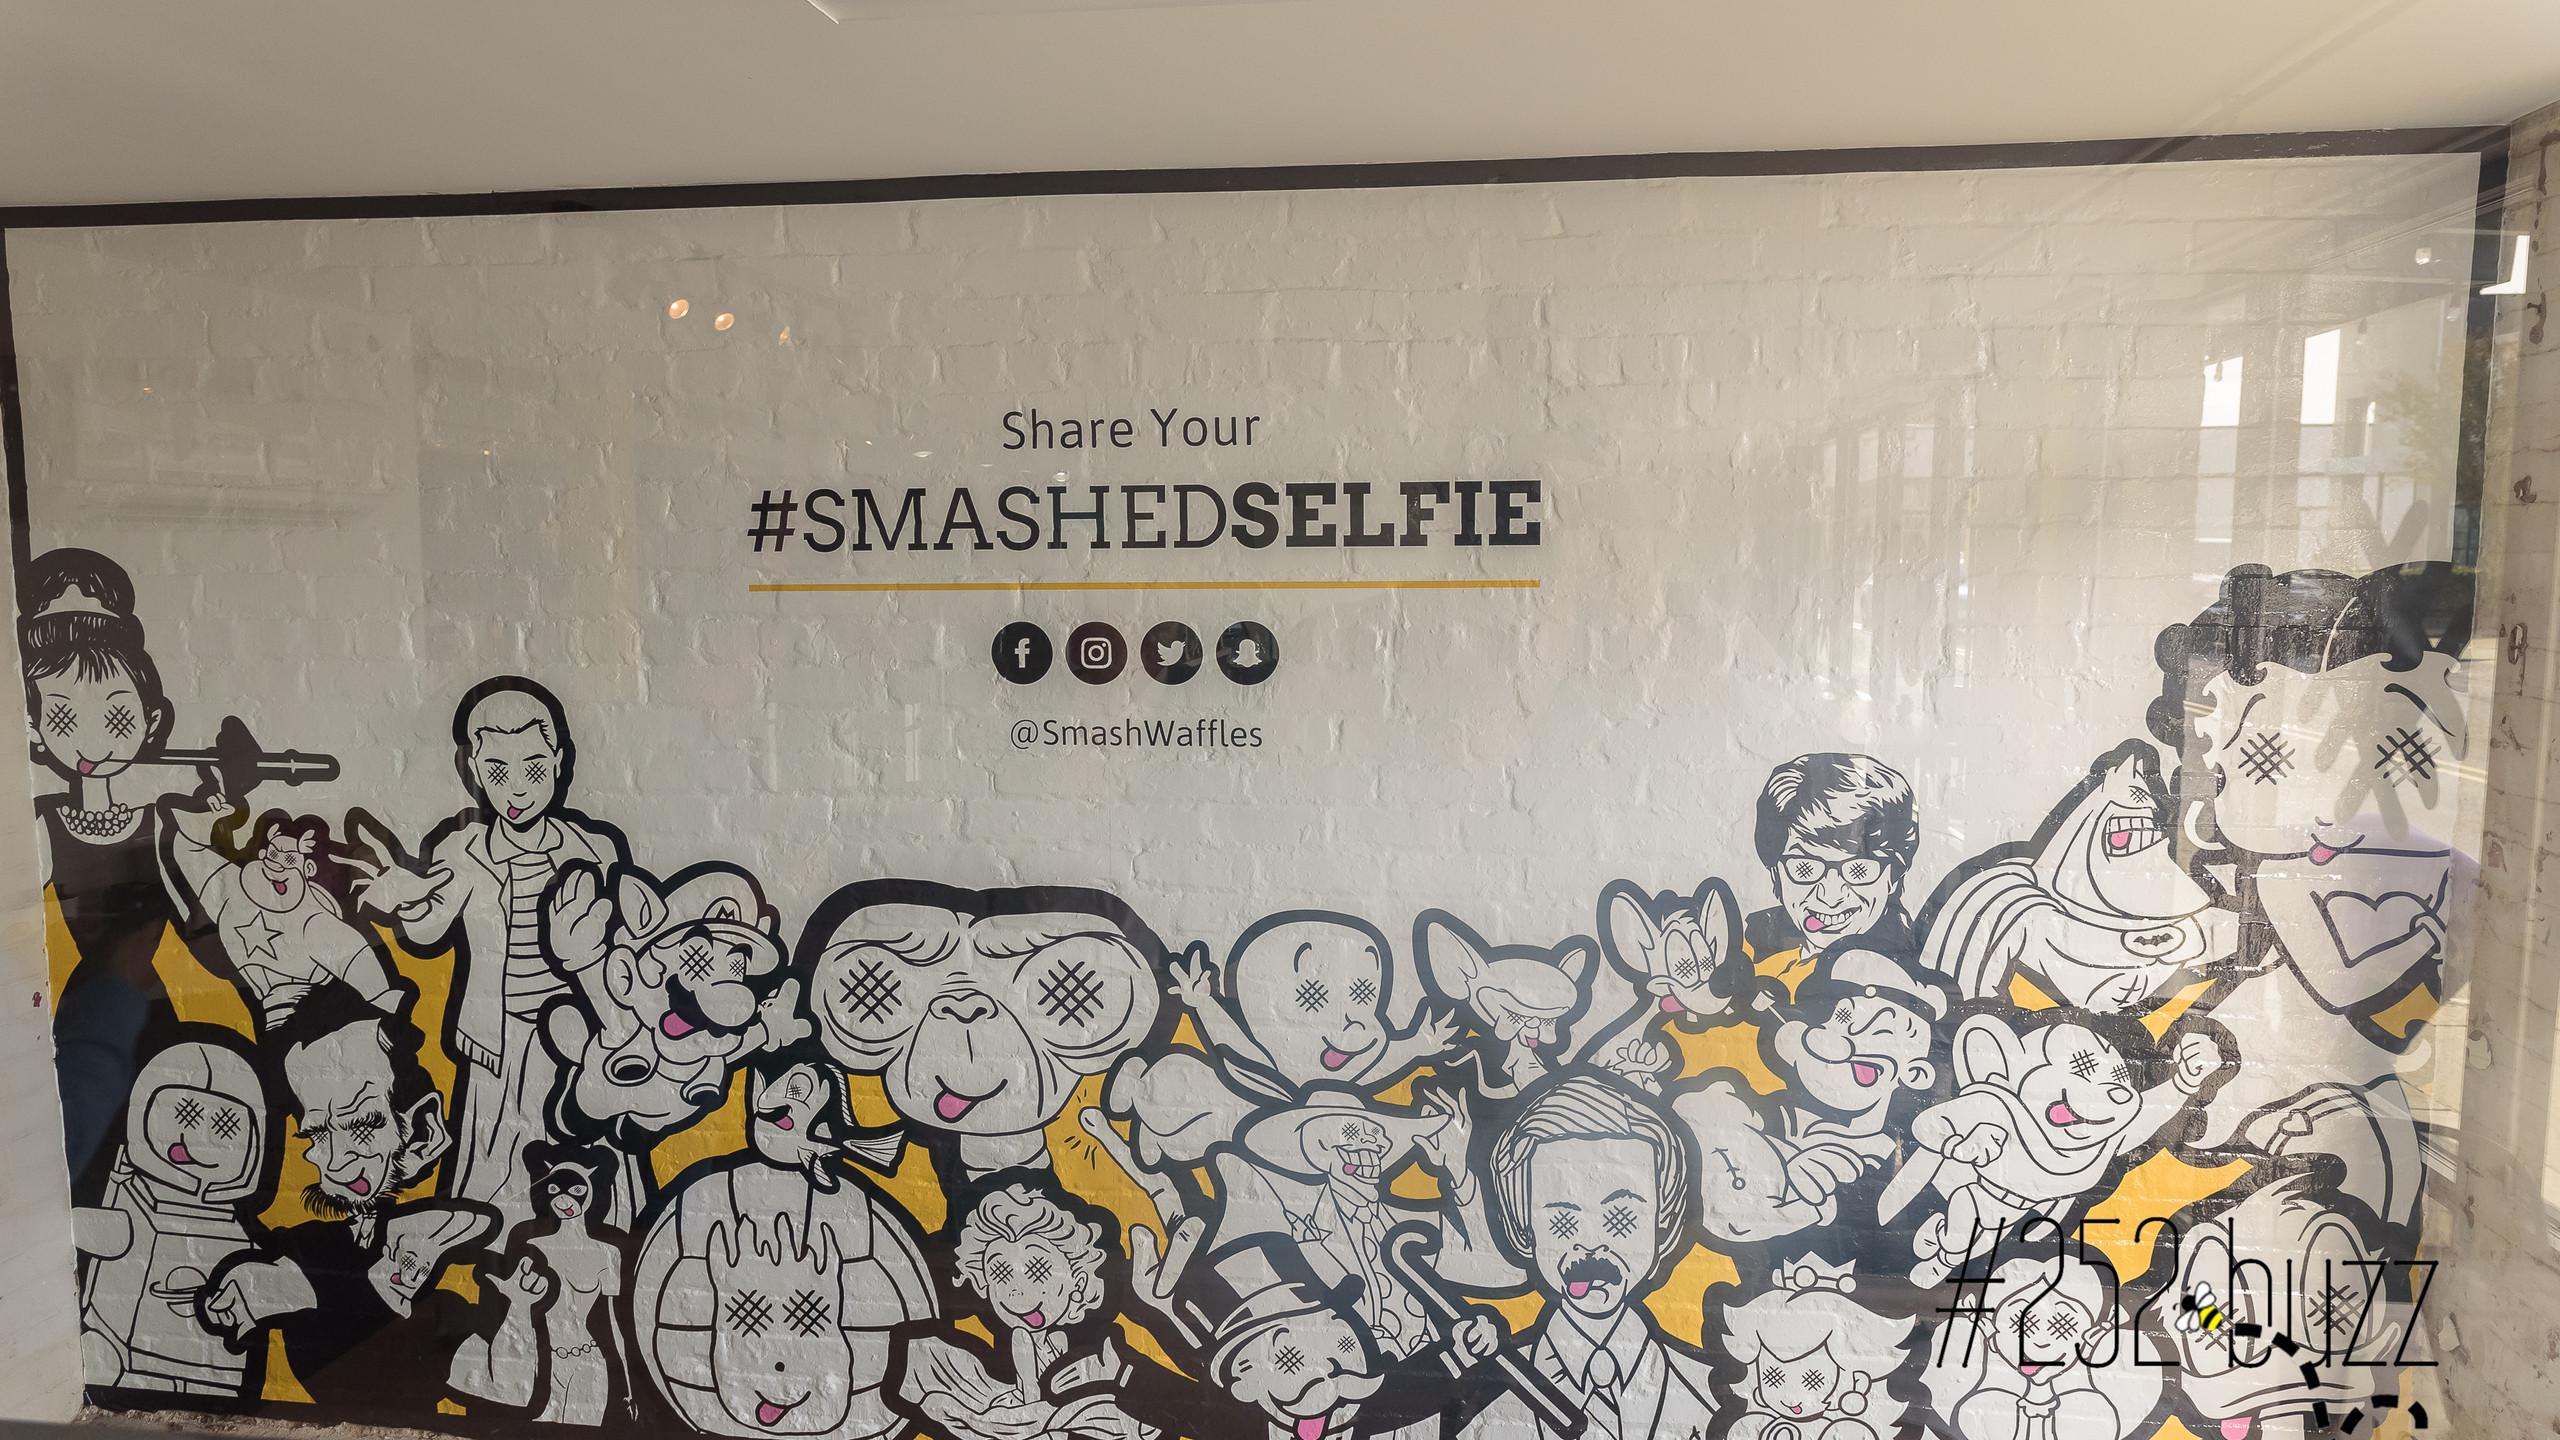 Smash Waffles Selfie Wall